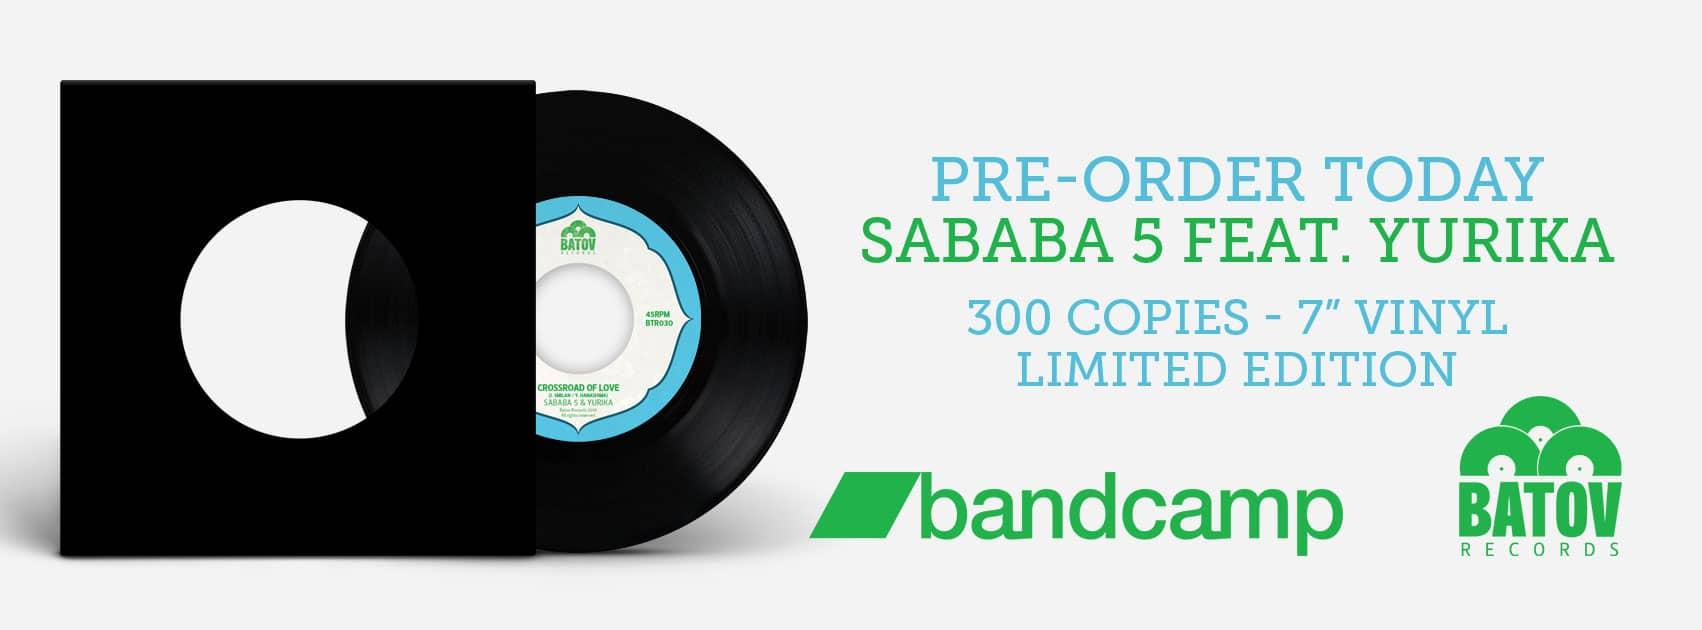 Sababa 5 feat. Yurika - Crossroad of Love {Vinyl pre-order} 1